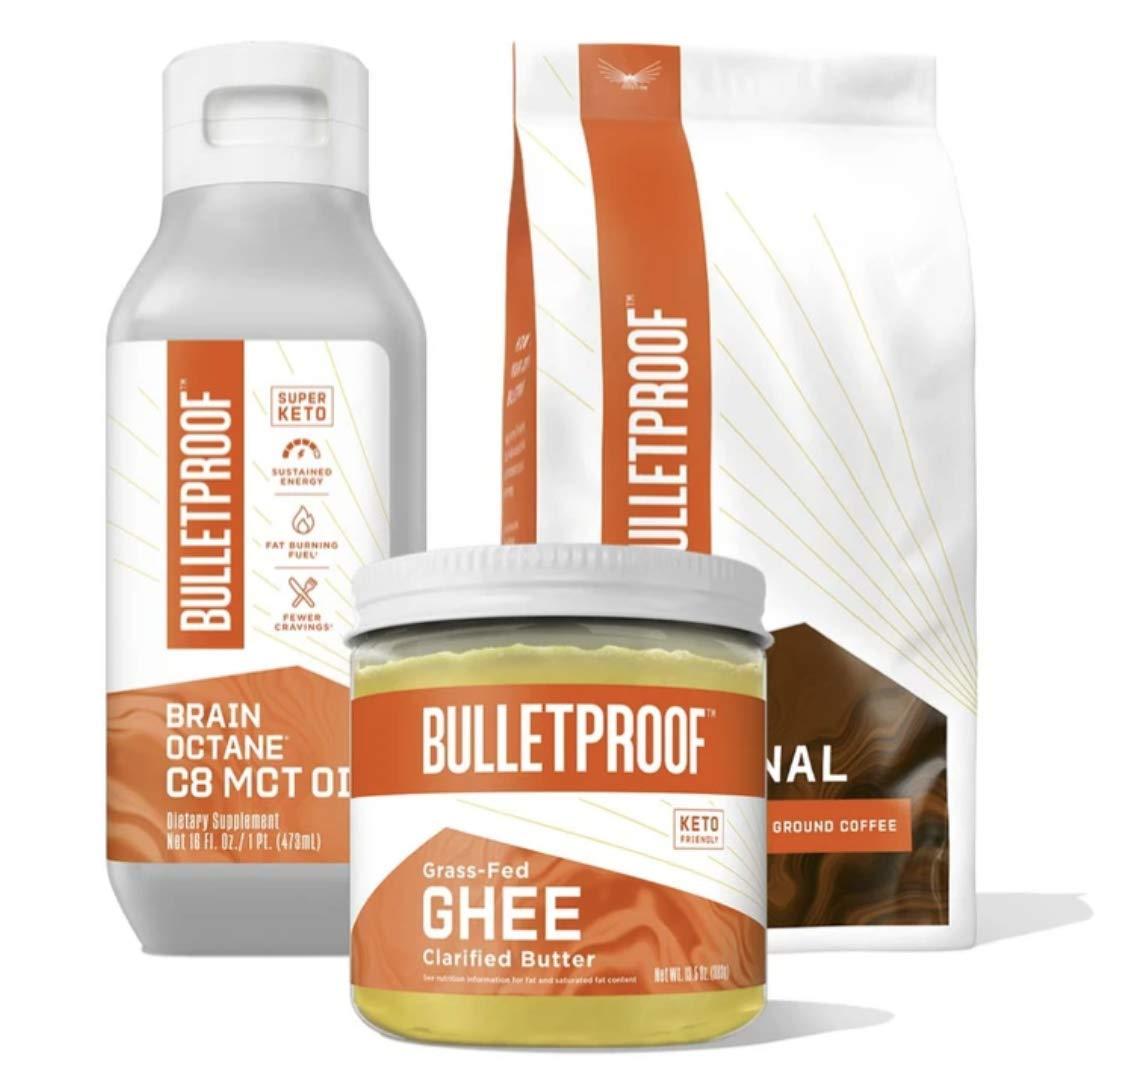 Bulletproof Coffee Starter Kit — The Original Medium Roast Ground Coffee - 12 Oz, Premium 100% C8 MCT Brain Octane Oil - 16 Oz, Grass-Fed Ghee Pasture Raised Clarified Butter Fat - 13.5 Oz